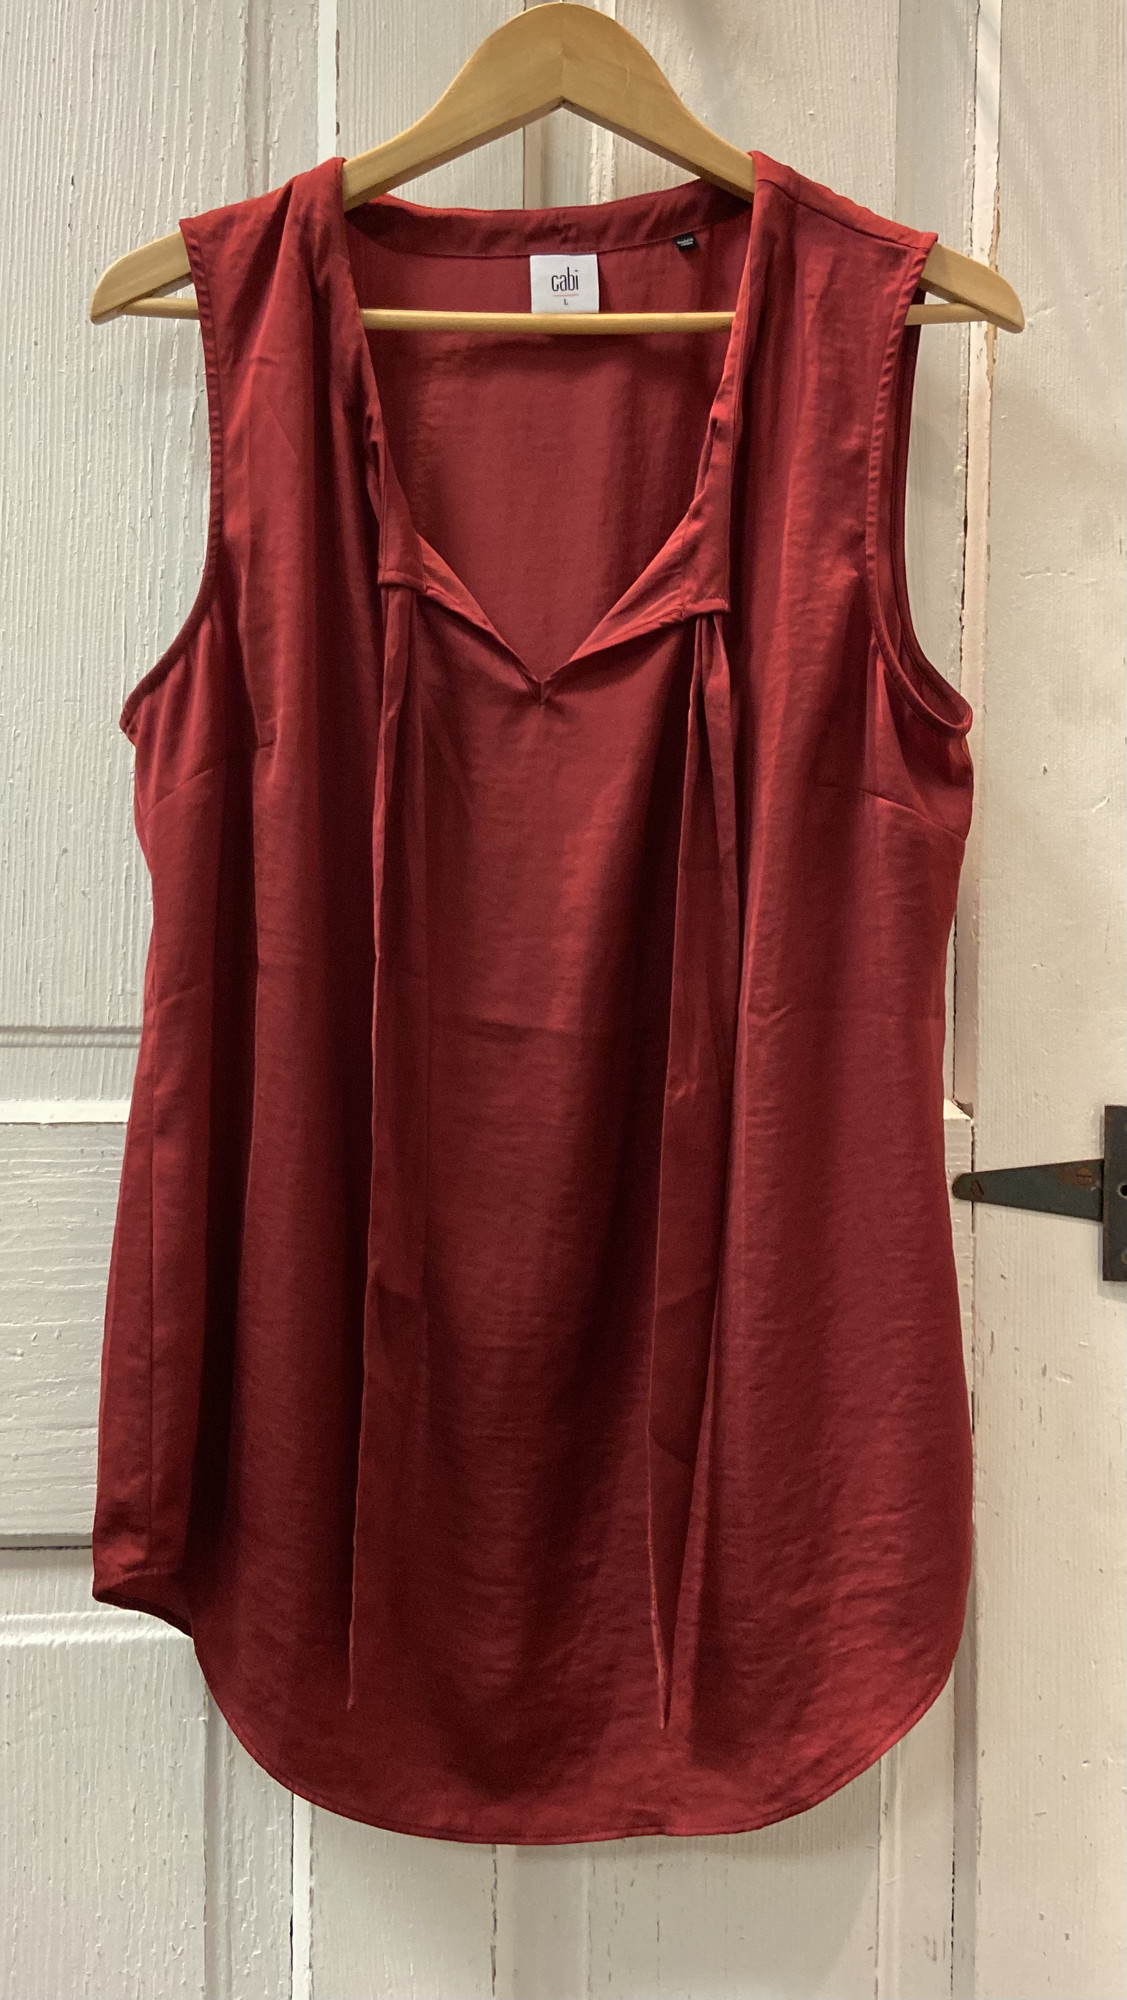 Merlot Dressy Tie Slvless<br /> Merlot<br /> Size: Large